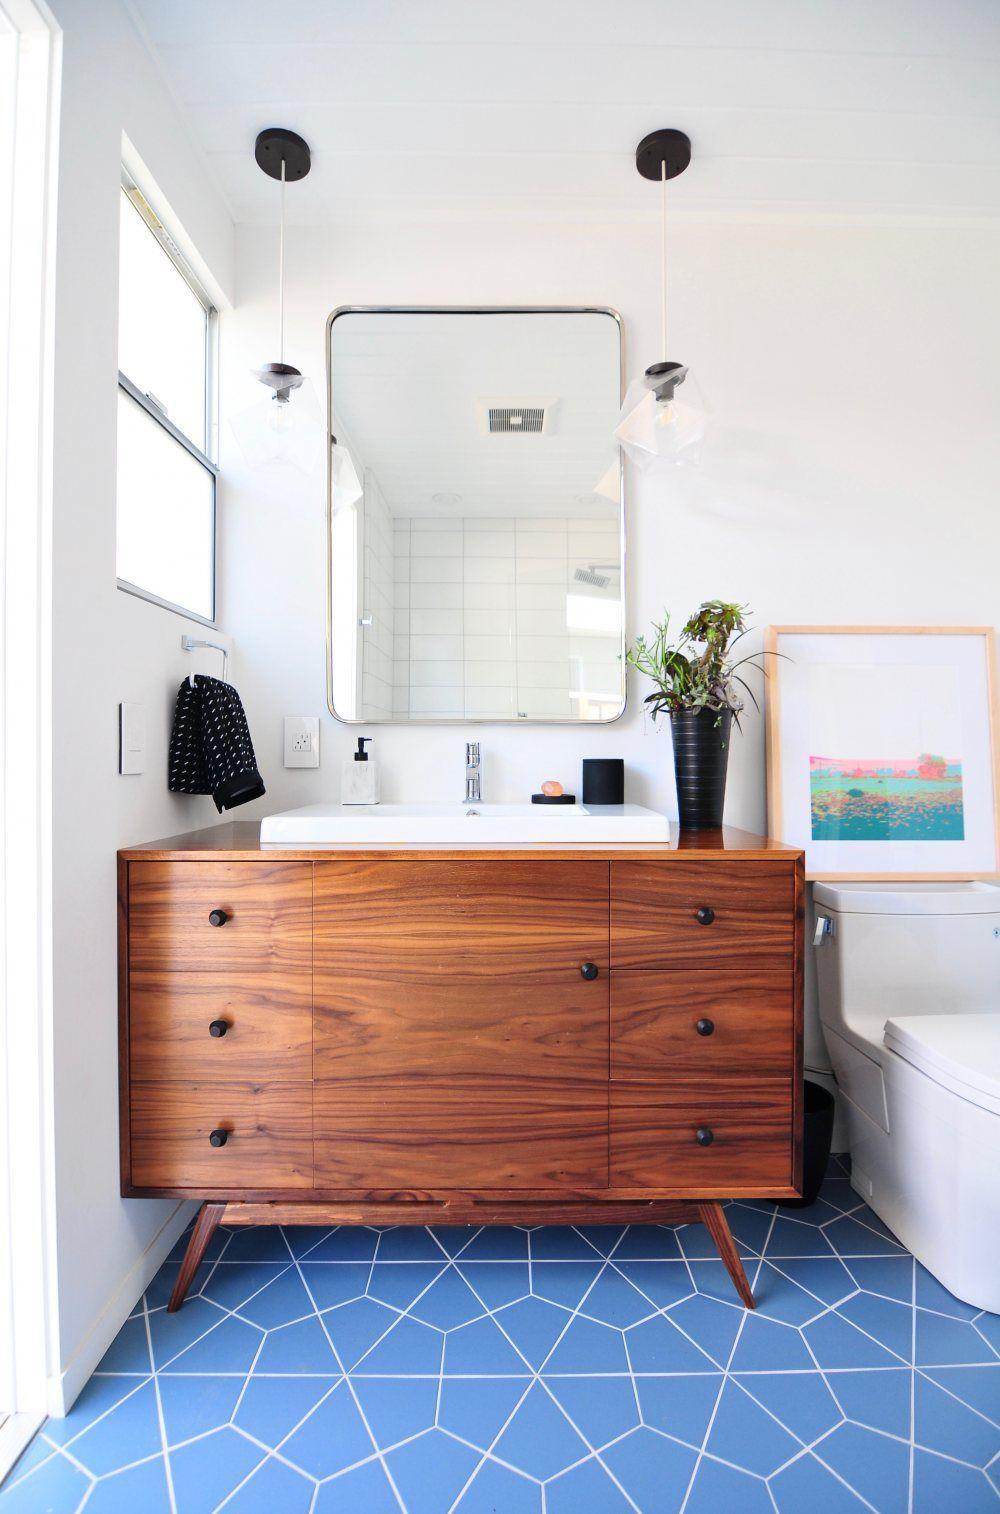 14 Midcentury Modern Bathroom Tile Ideas Hunker